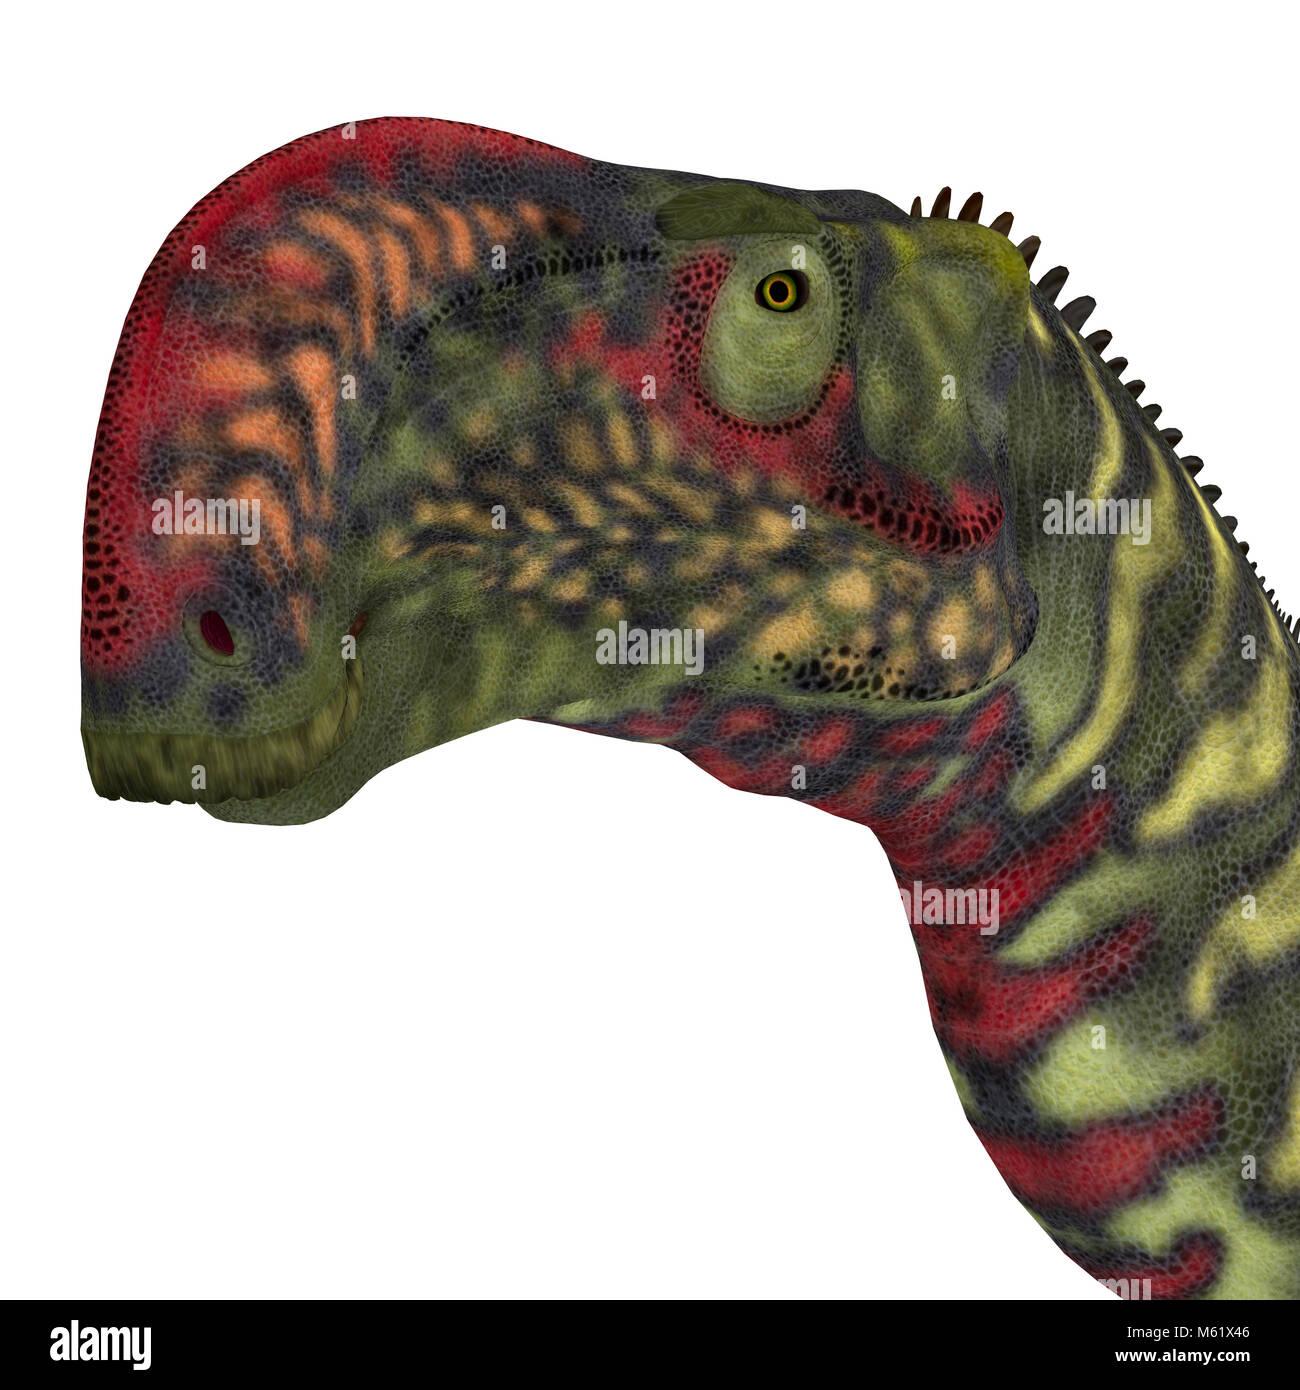 Altirhinus was an iguanodont herbivore dinosaur from the Cretaceous Period of Mongolia. - Stock Image